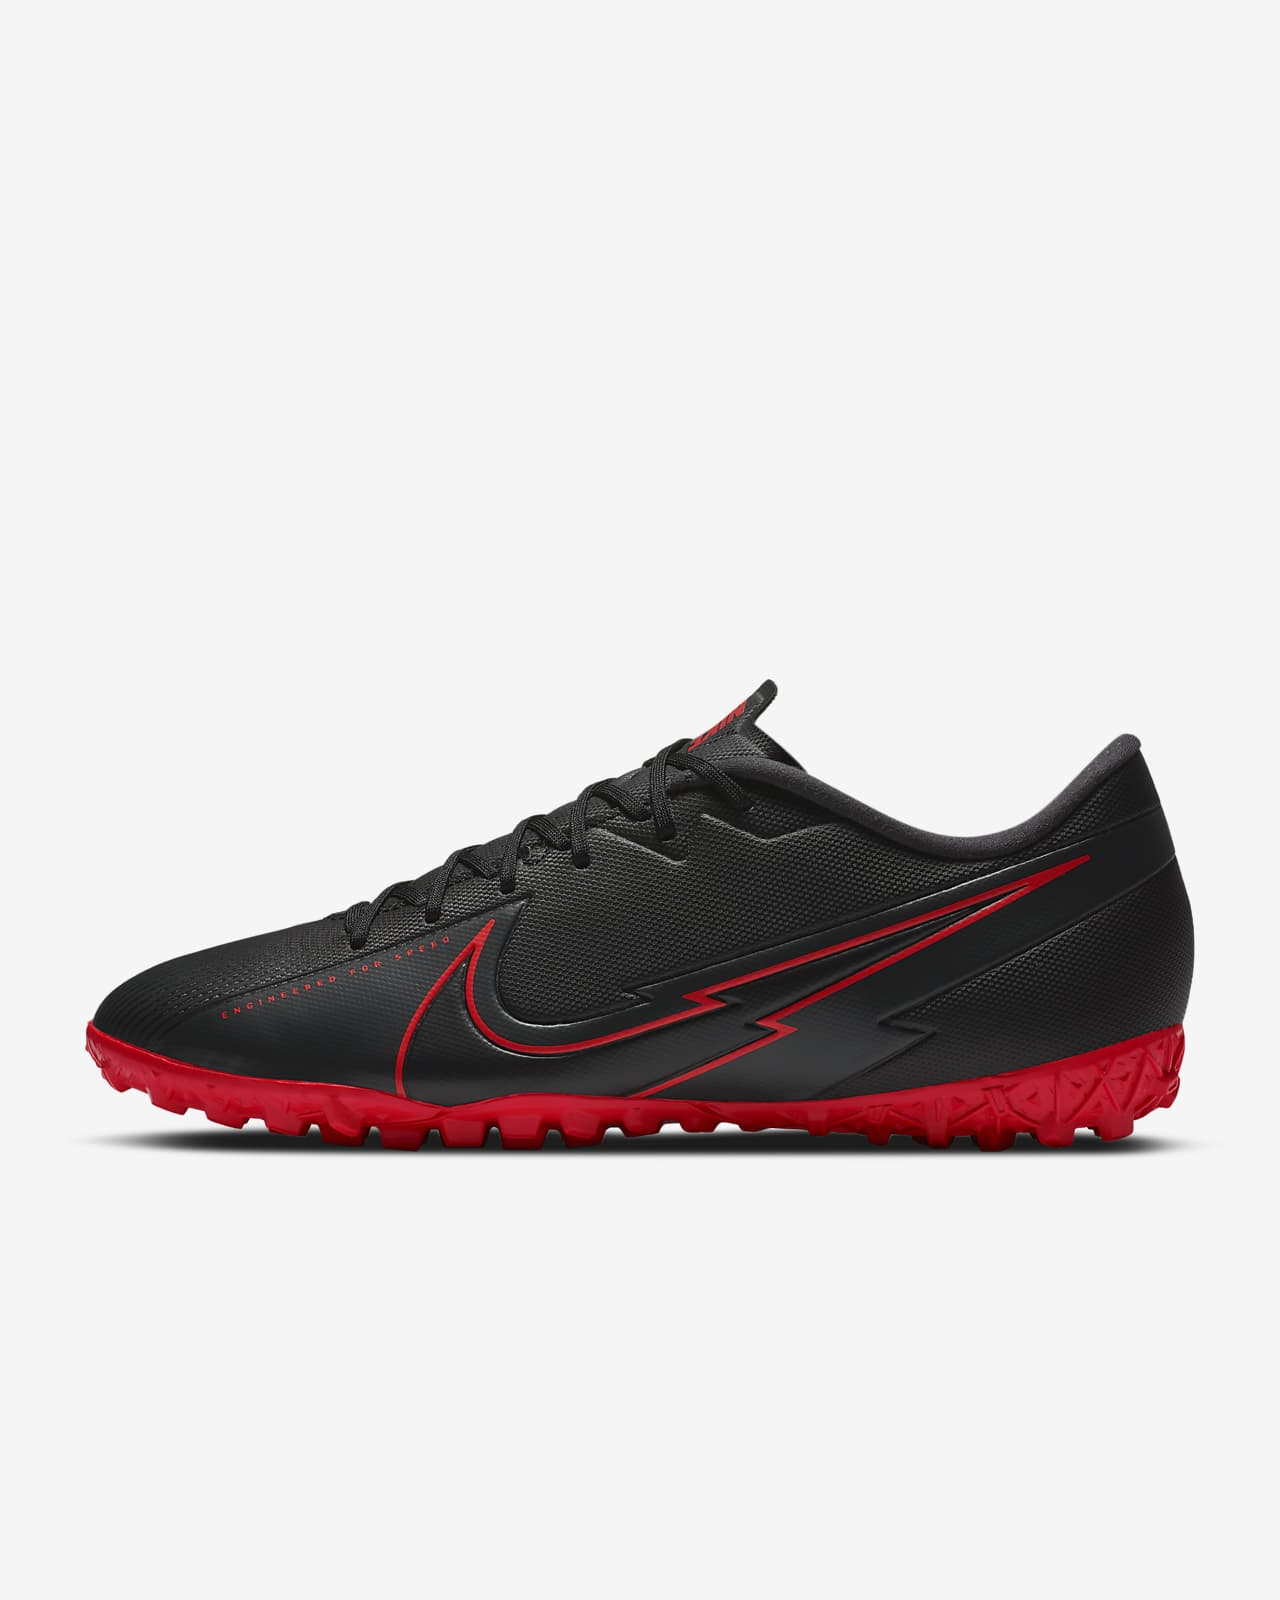 Scarpa da calcio per erba sintetica Nike Mercurial Vapor 13 Academy TF